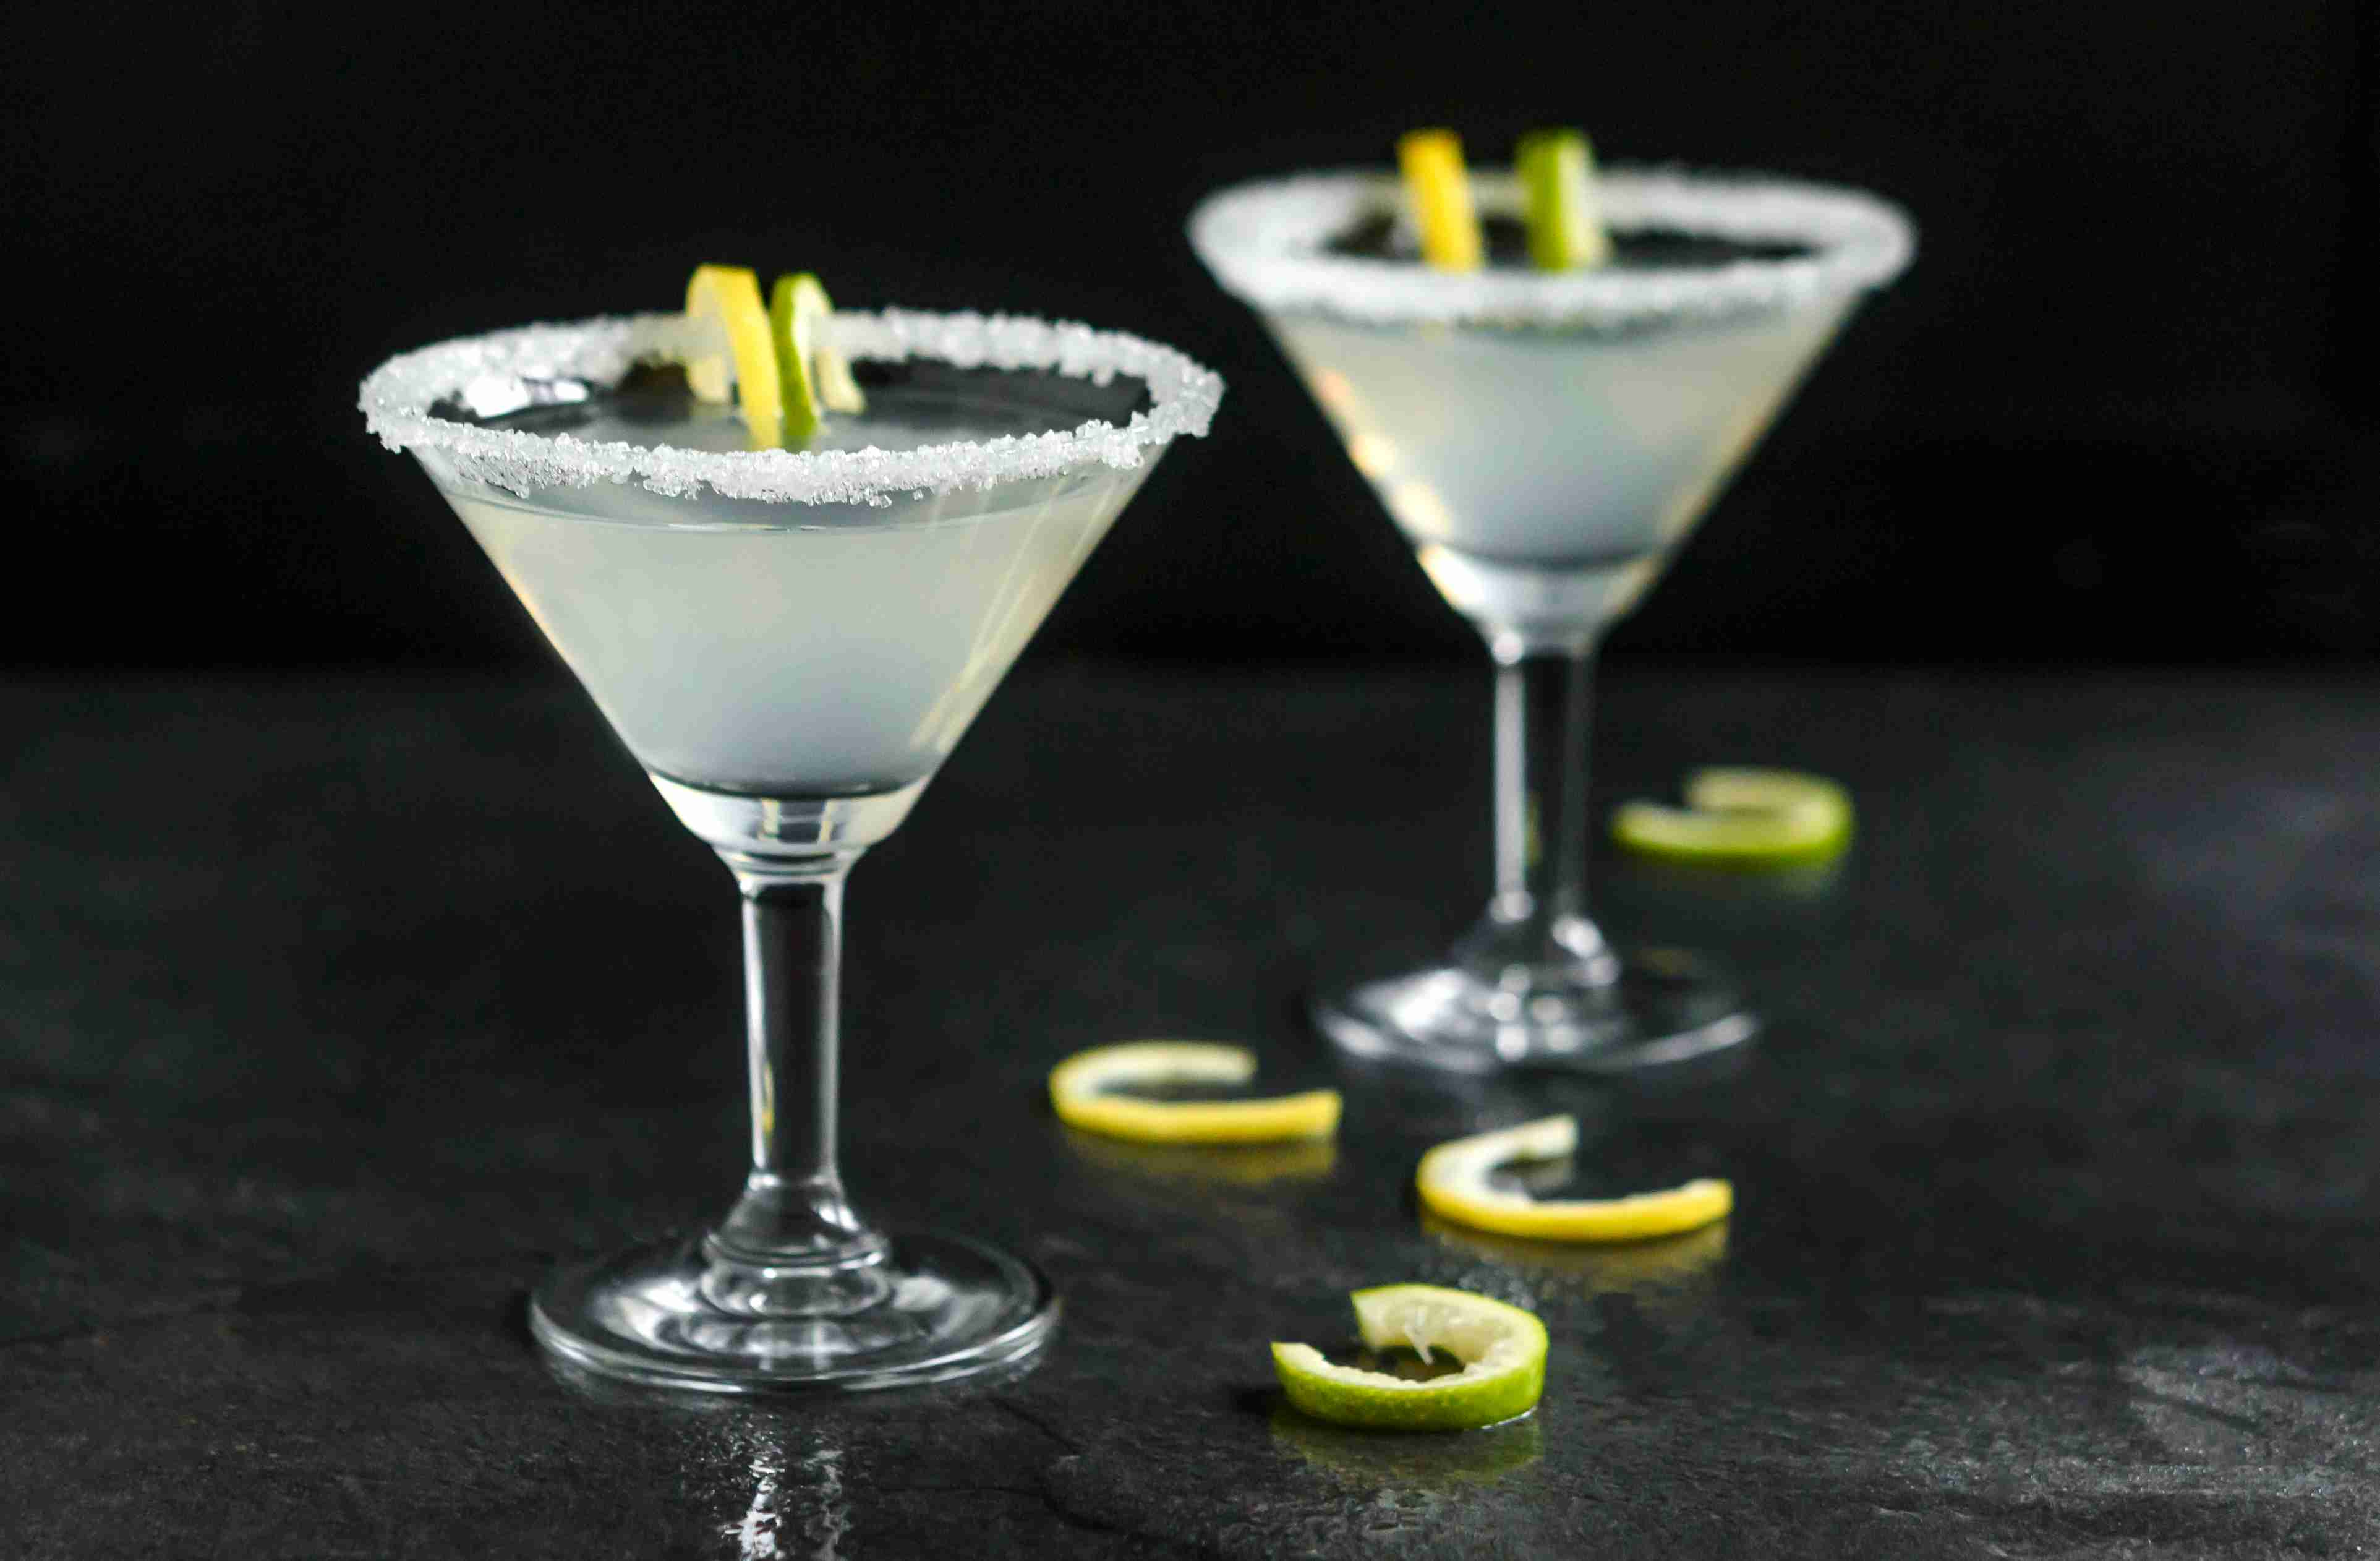 Бокалы с мартини и сахаром